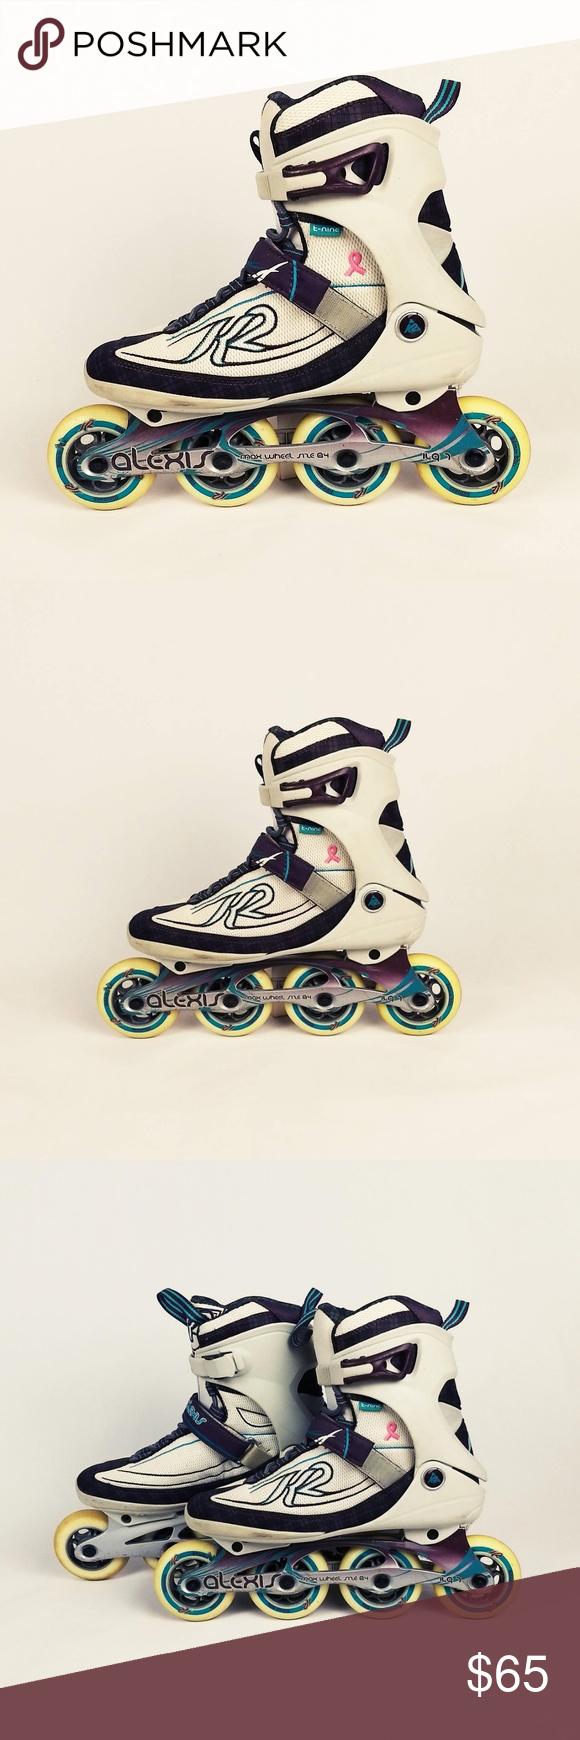 a5b10d4a858014 K2 Alexis 80 Pro Inline Skates 84mm Womens Size 9 K2 Alexis 80 Pro Inline  Skates